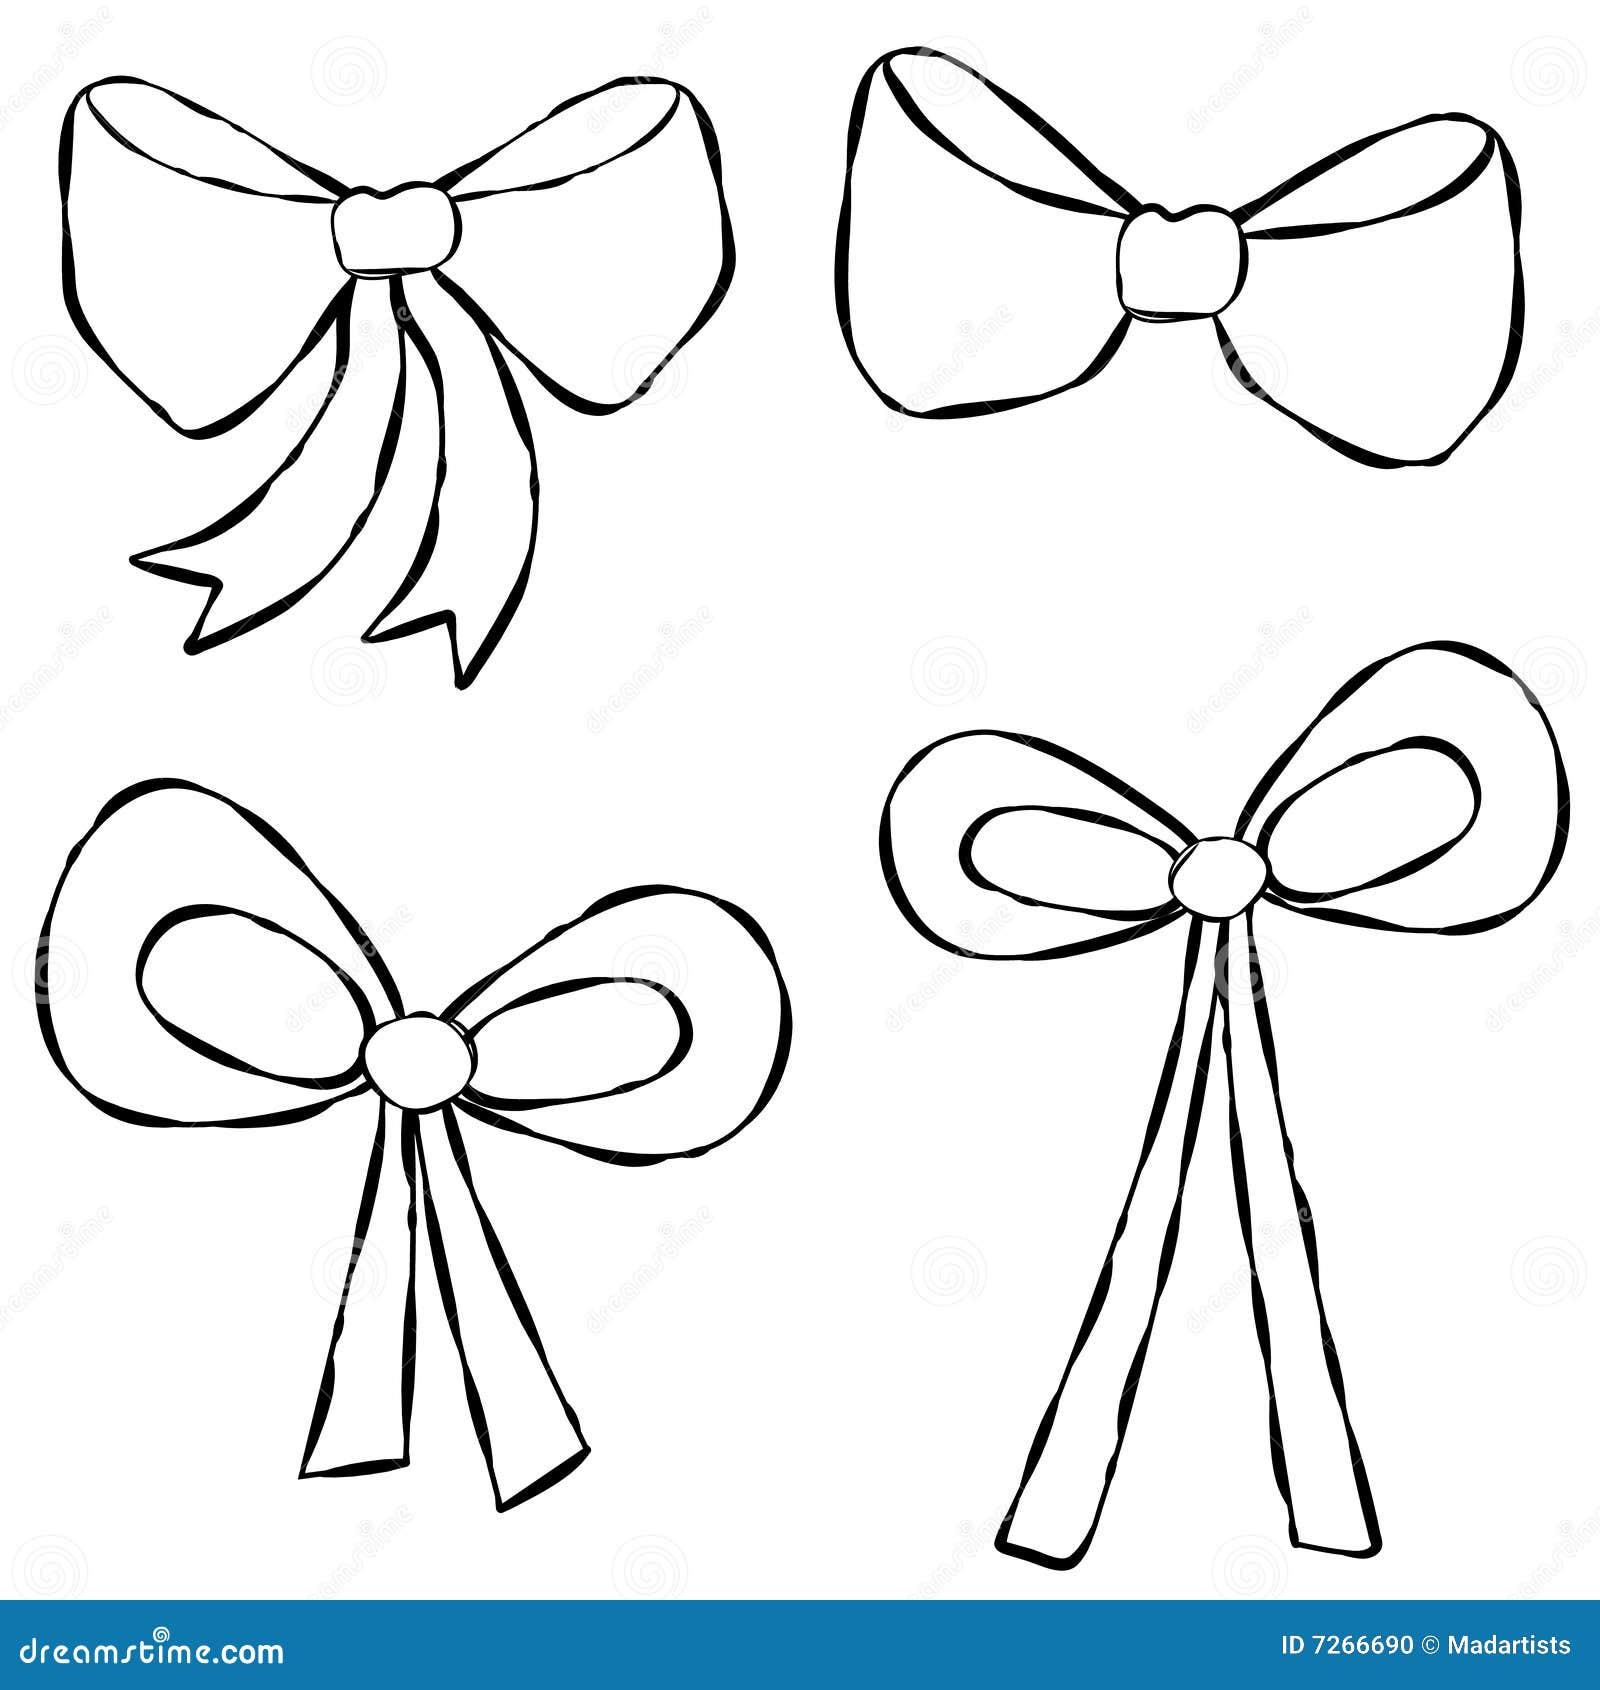 Line Art Ribbon : Ribbons bows line art stock illustration of